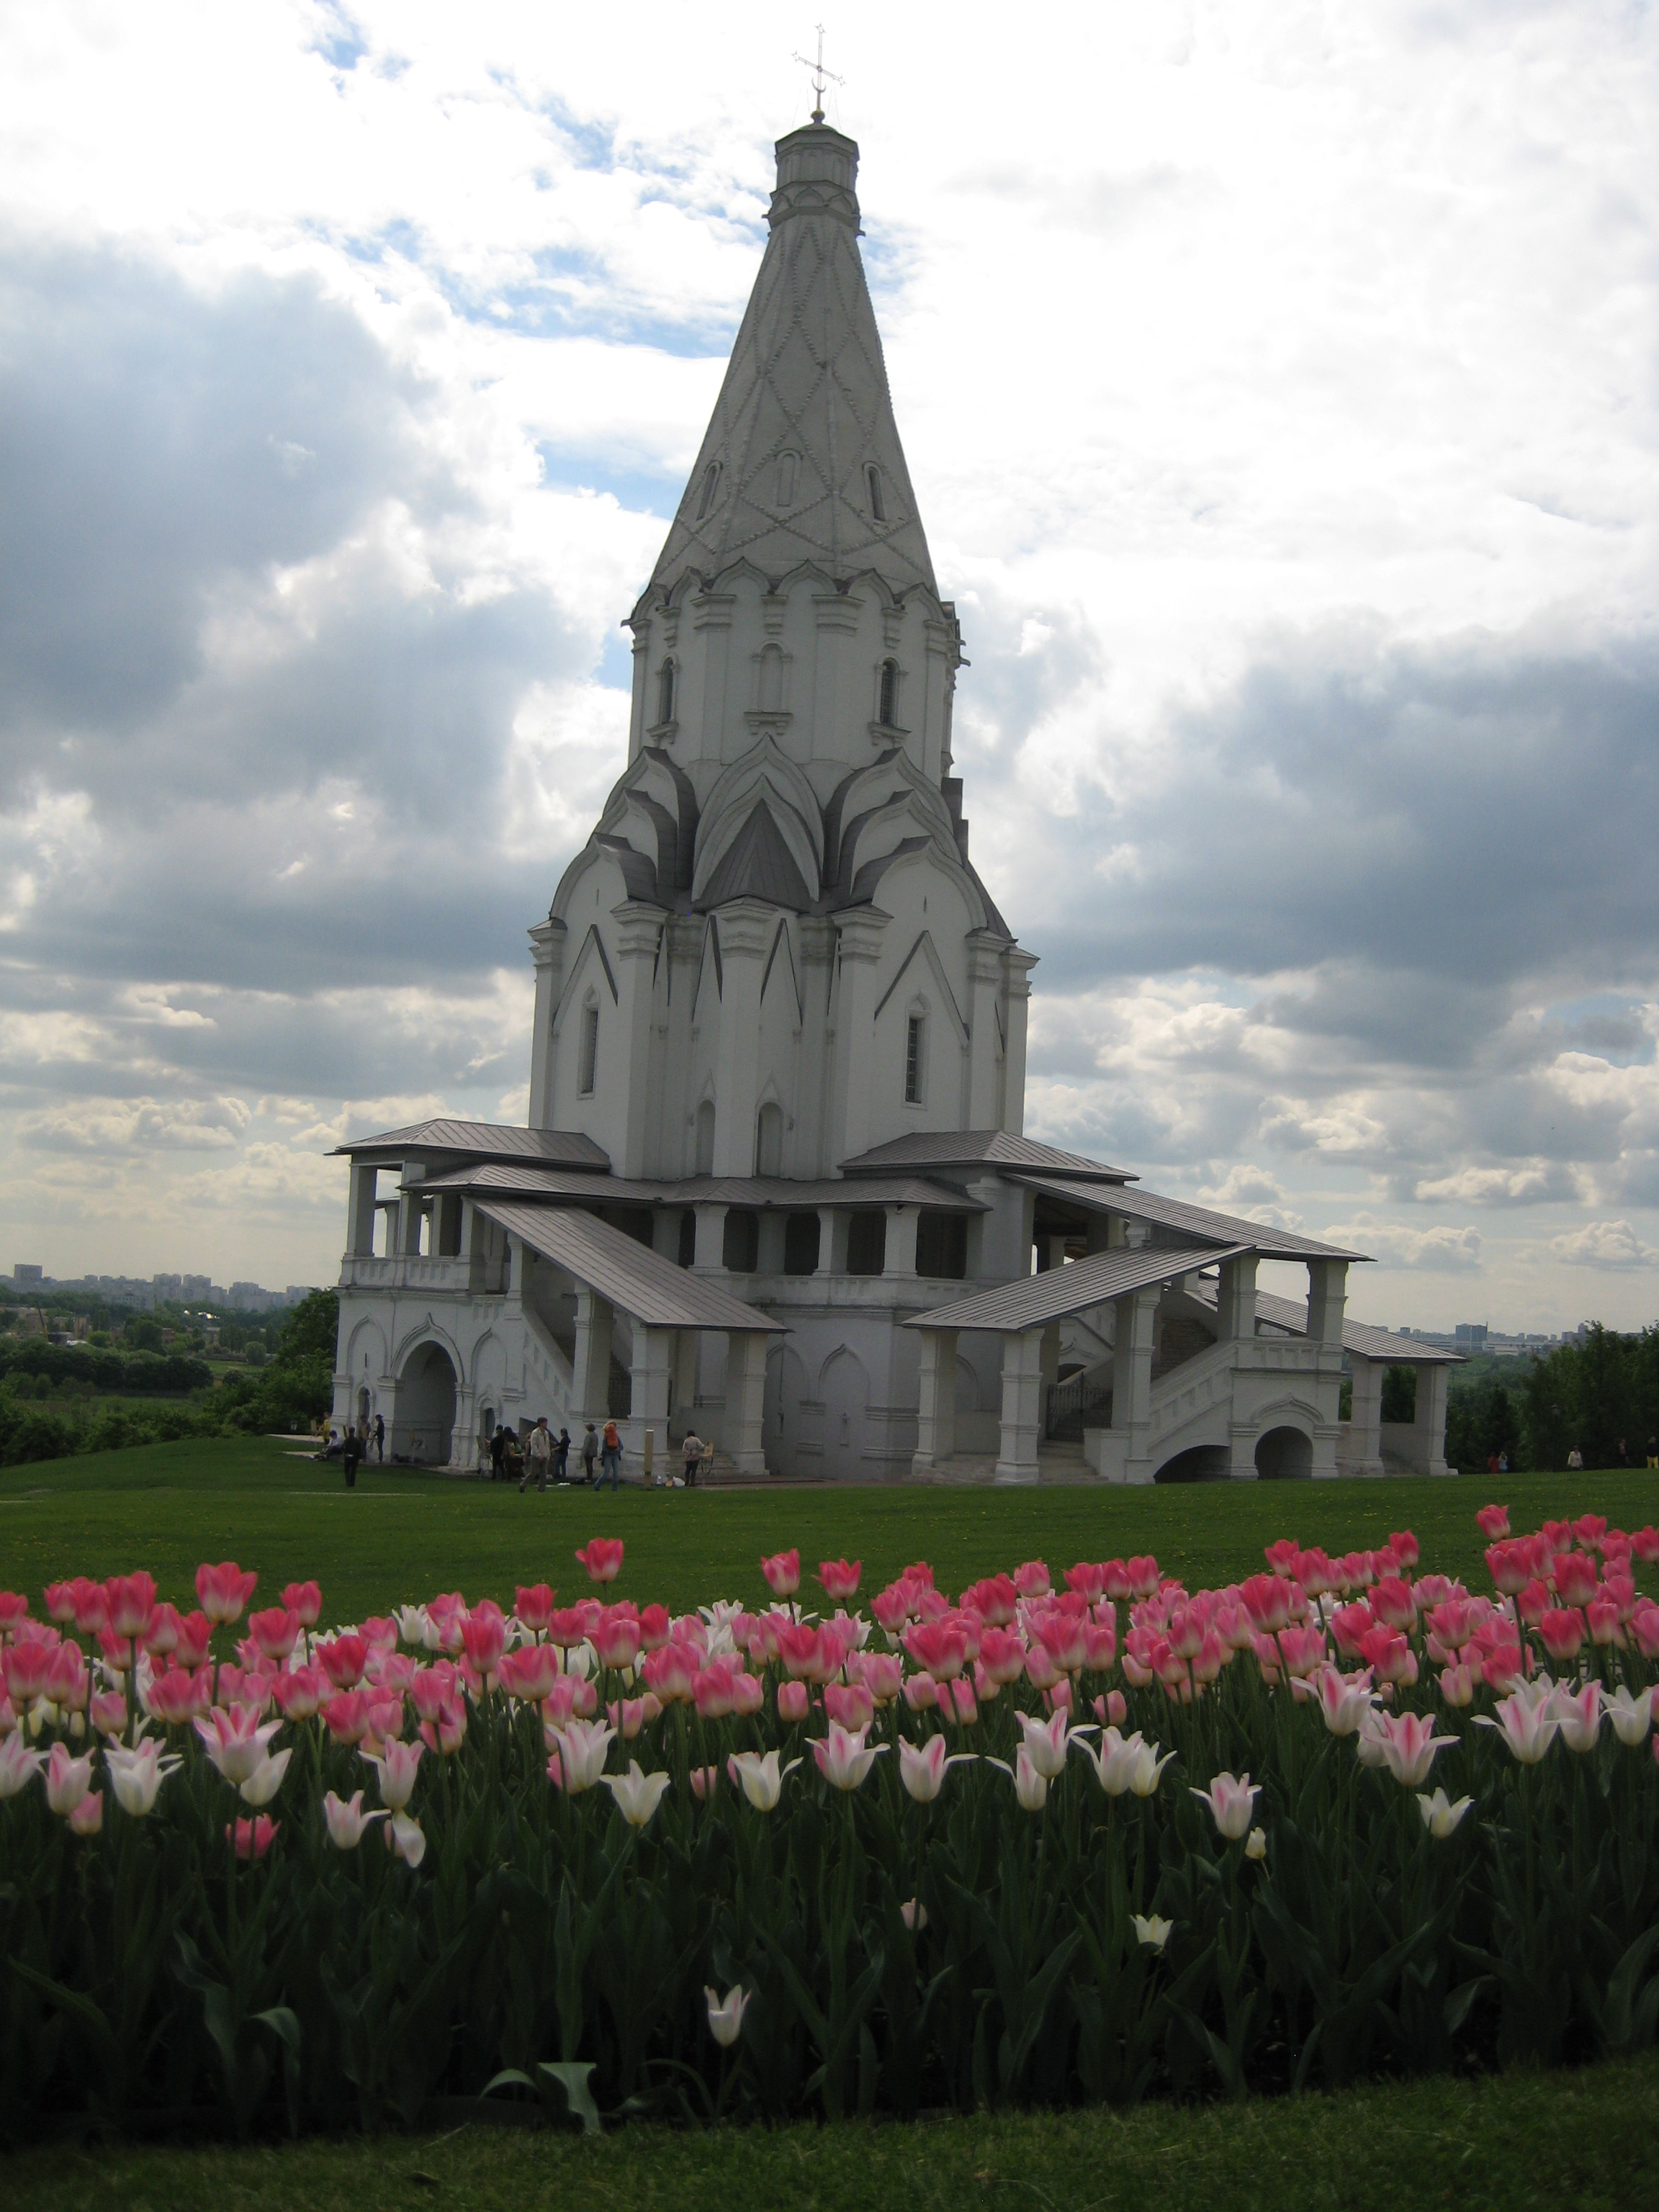 ascension-church-at-kolomenskoe